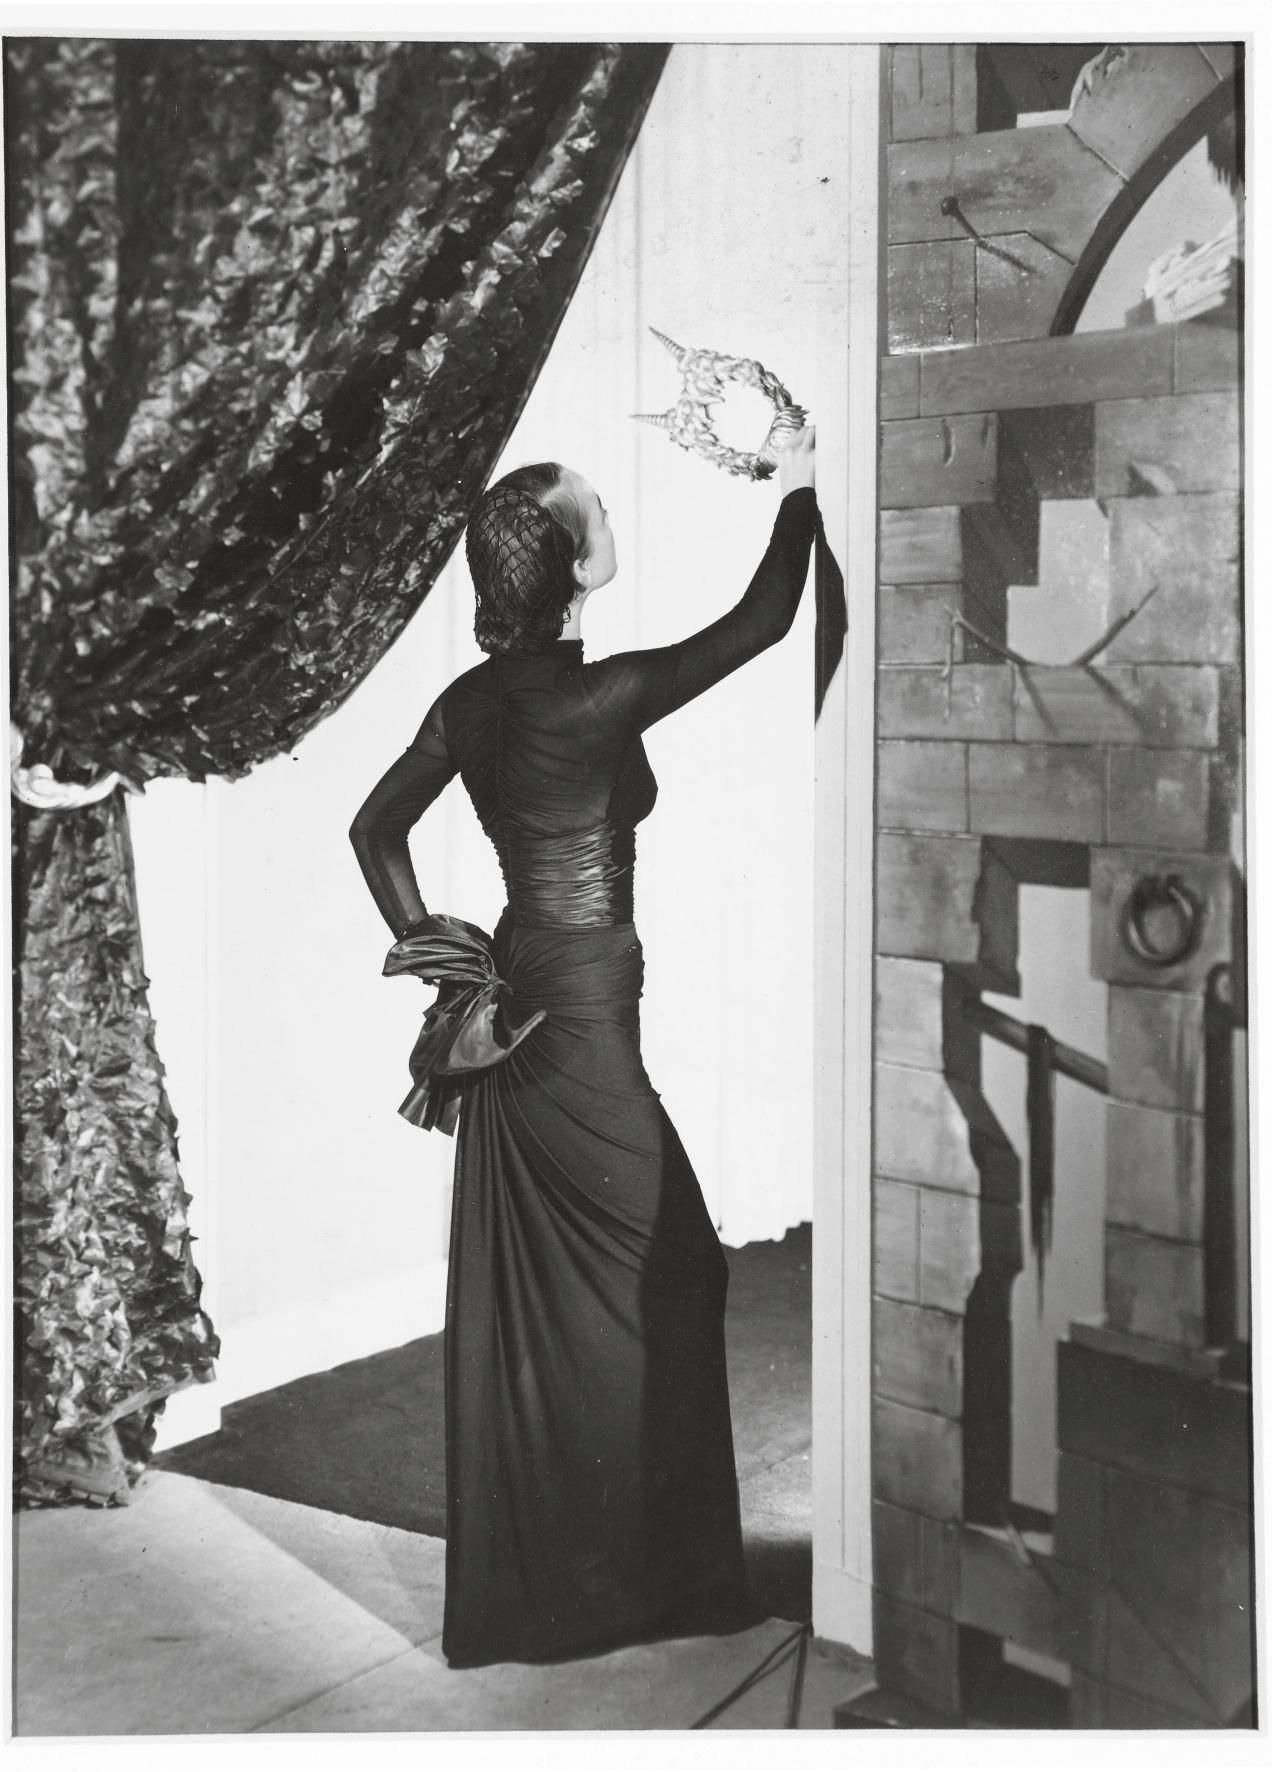 Fashion study, circa 1939-1940